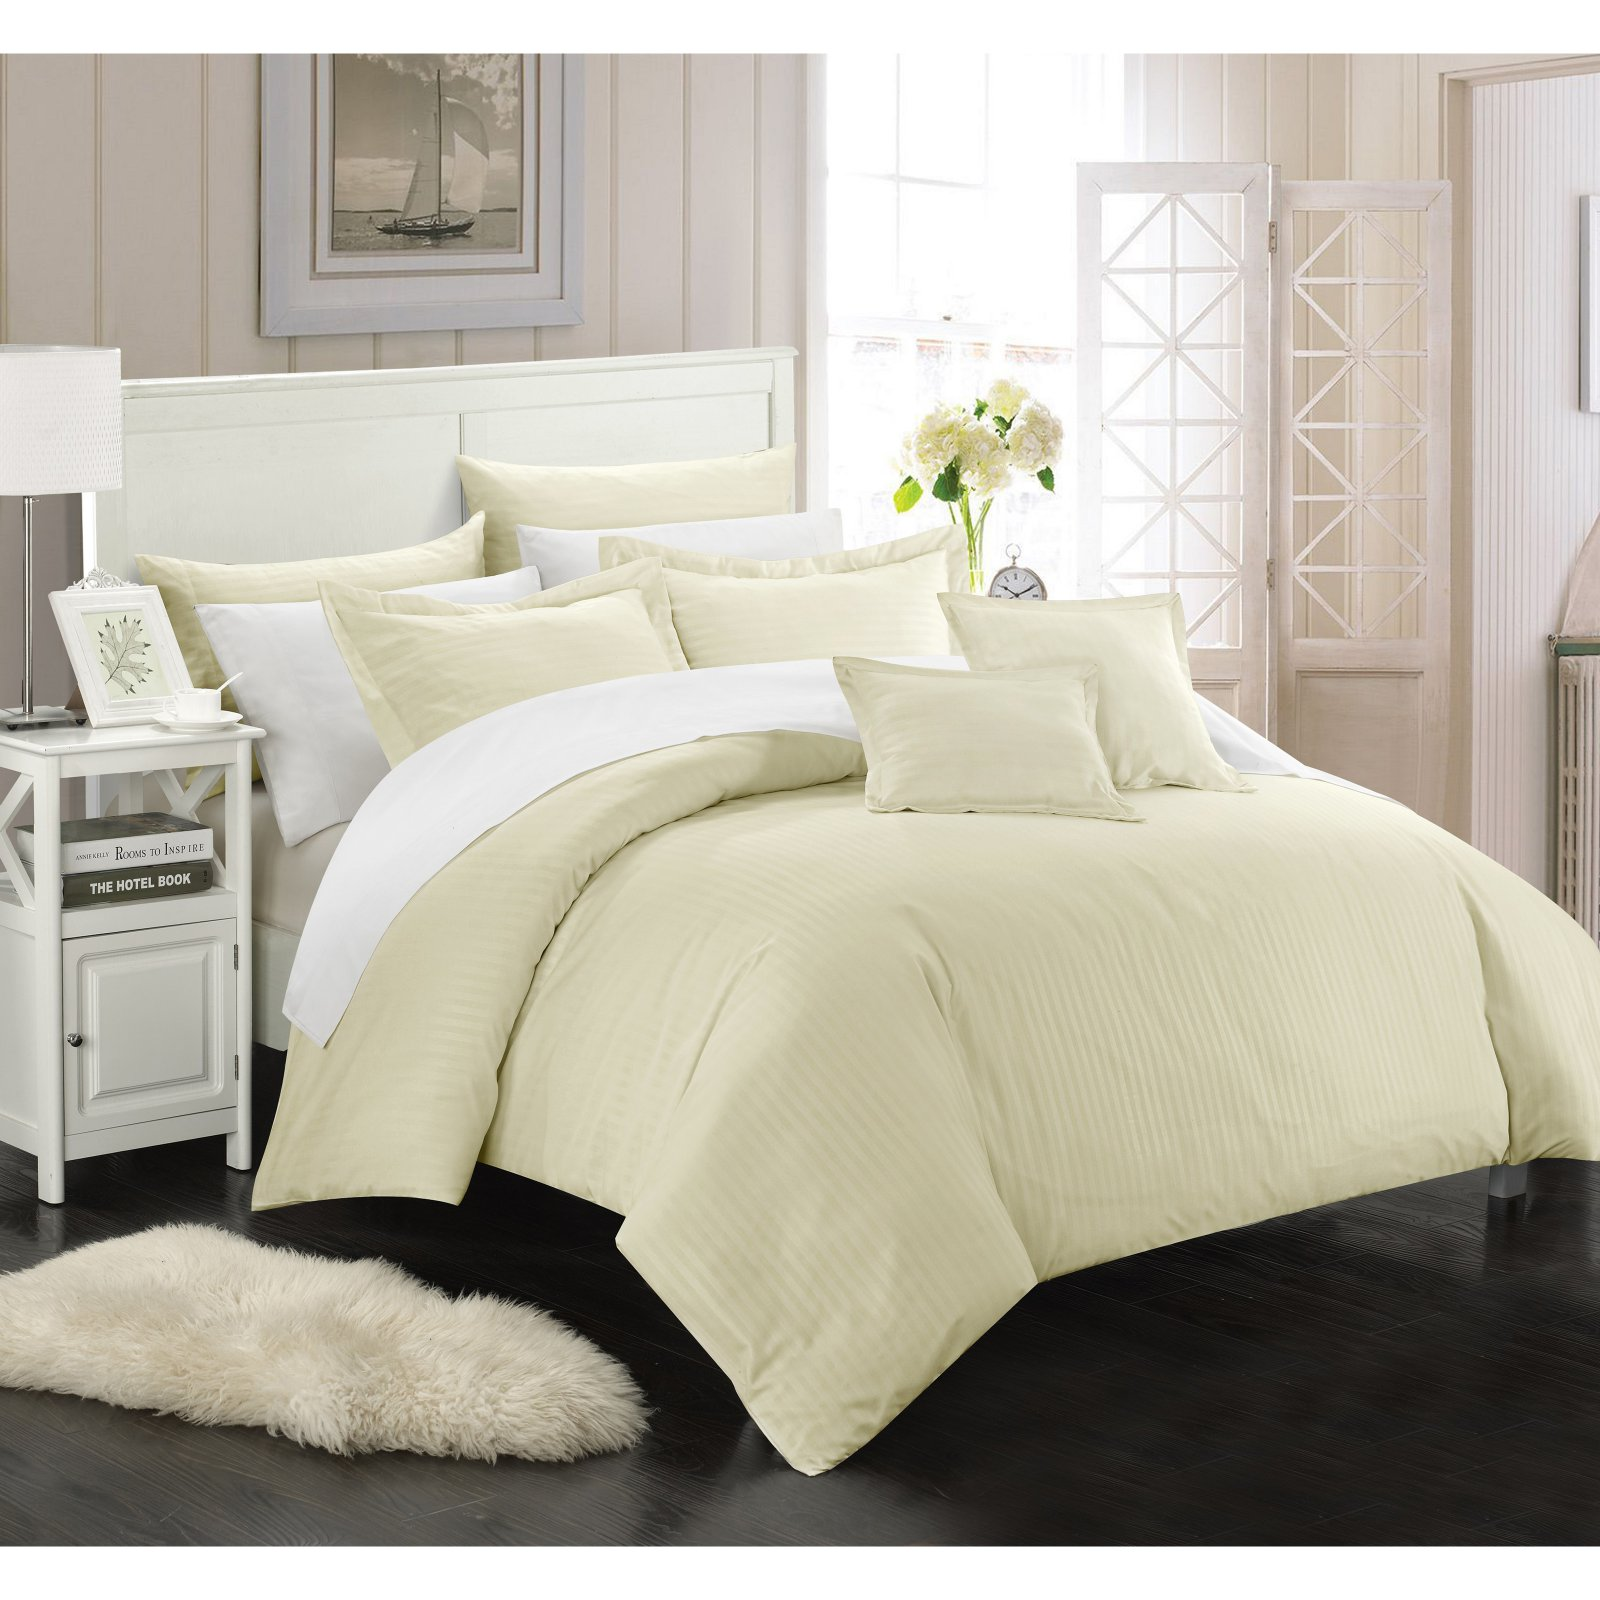 Chic Home 5-Piece Keynes Down Alternative Jacquard Striped Comforter Set